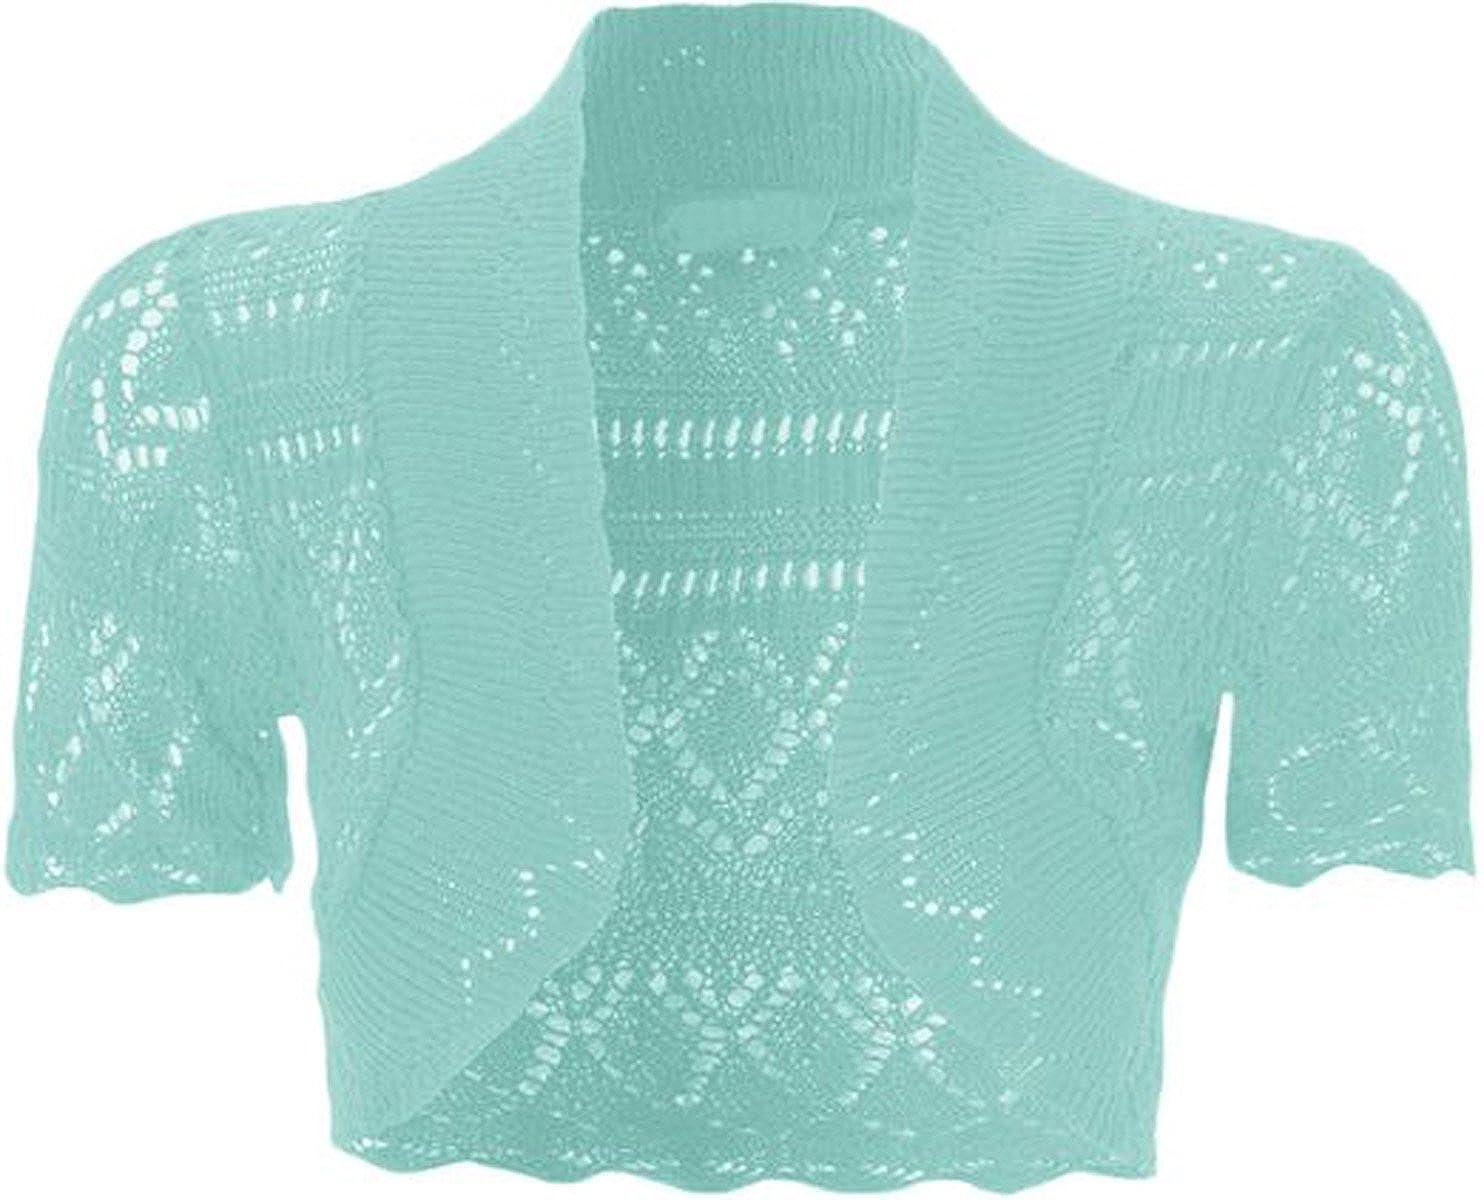 a2378d091b Amazon.com  FashionMark Girls Kids Crochet Knitted Bolero Shrug Top   Clothing